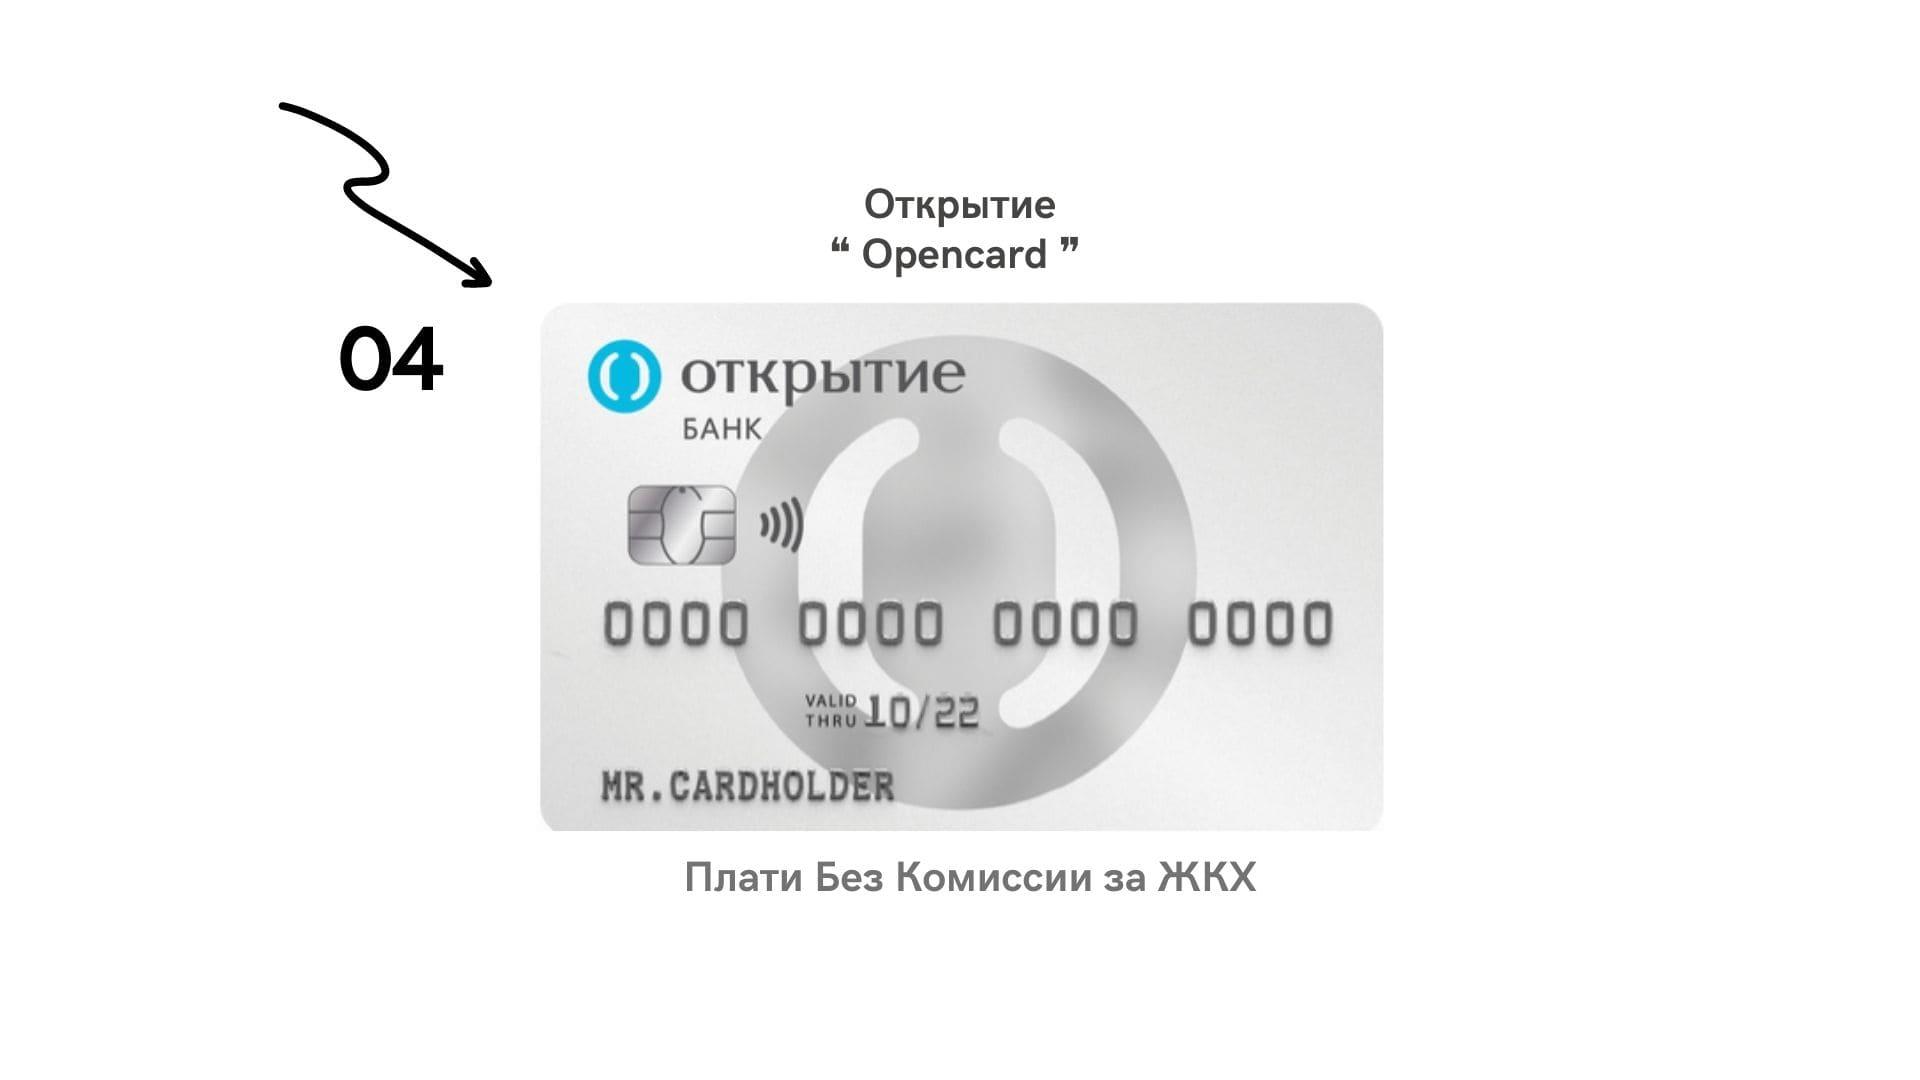 банк открытие оплата жкх без комиссии